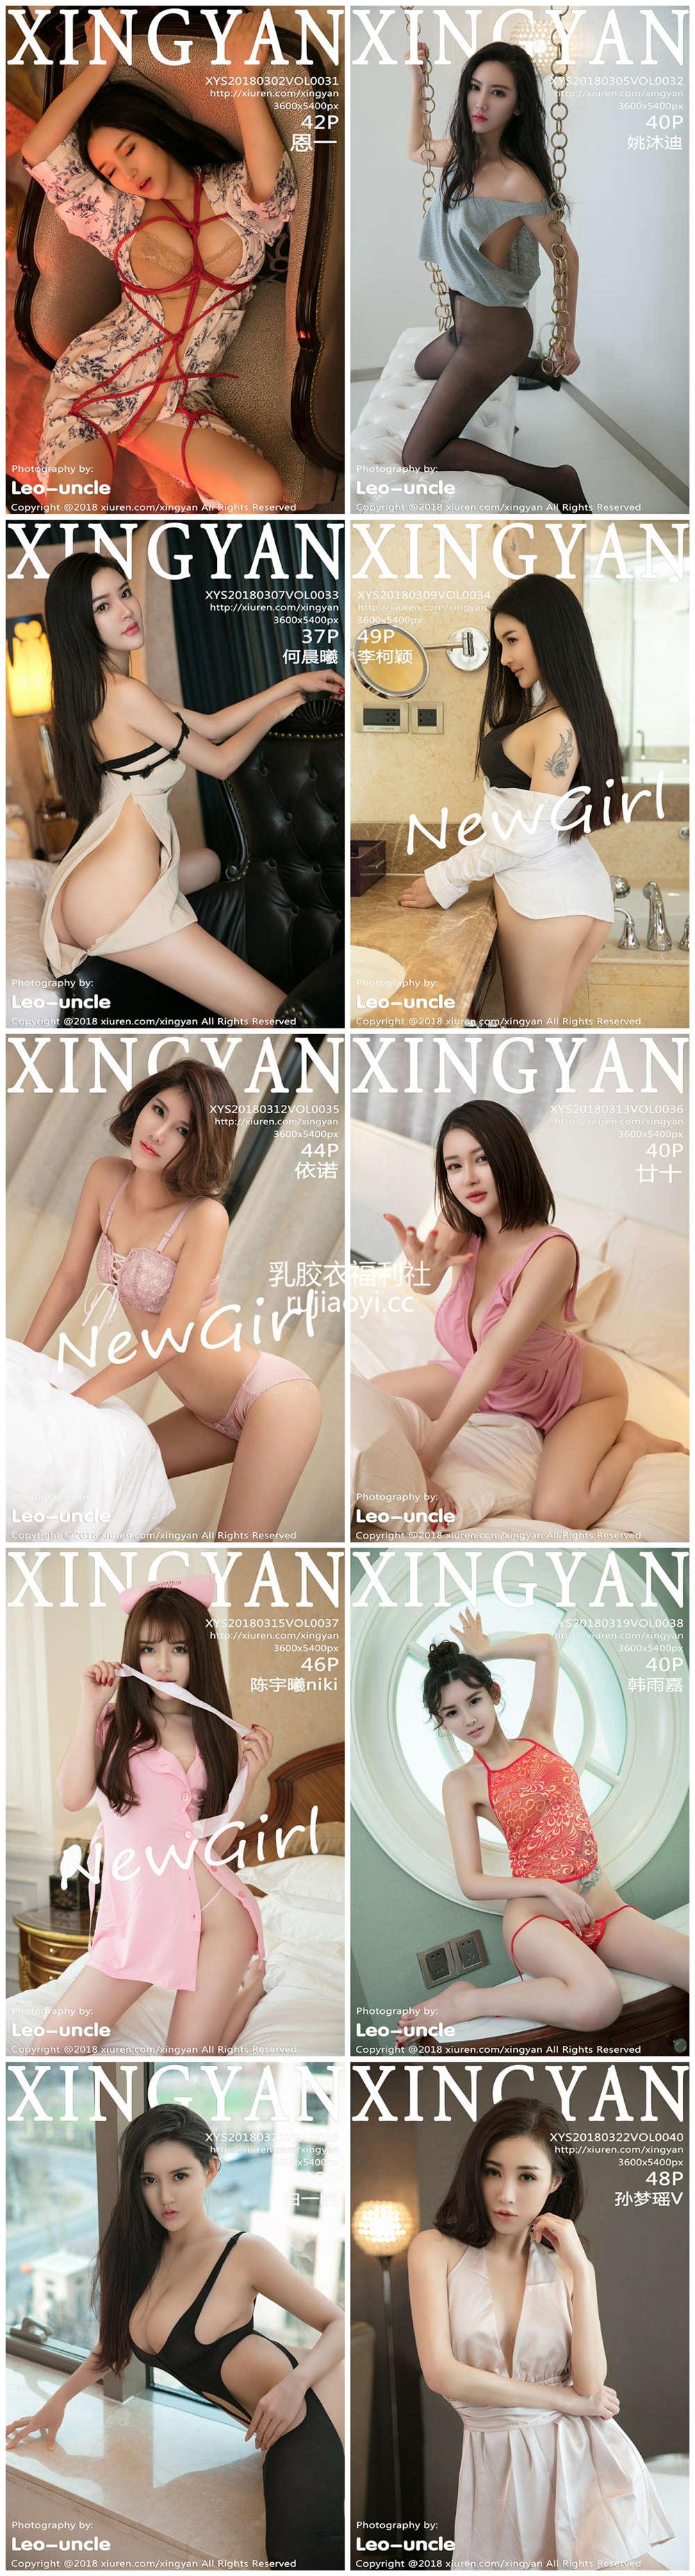 [XINGYAN星颜社] Vol.031-040 秀人系列 10期性感写真百度云合集下载